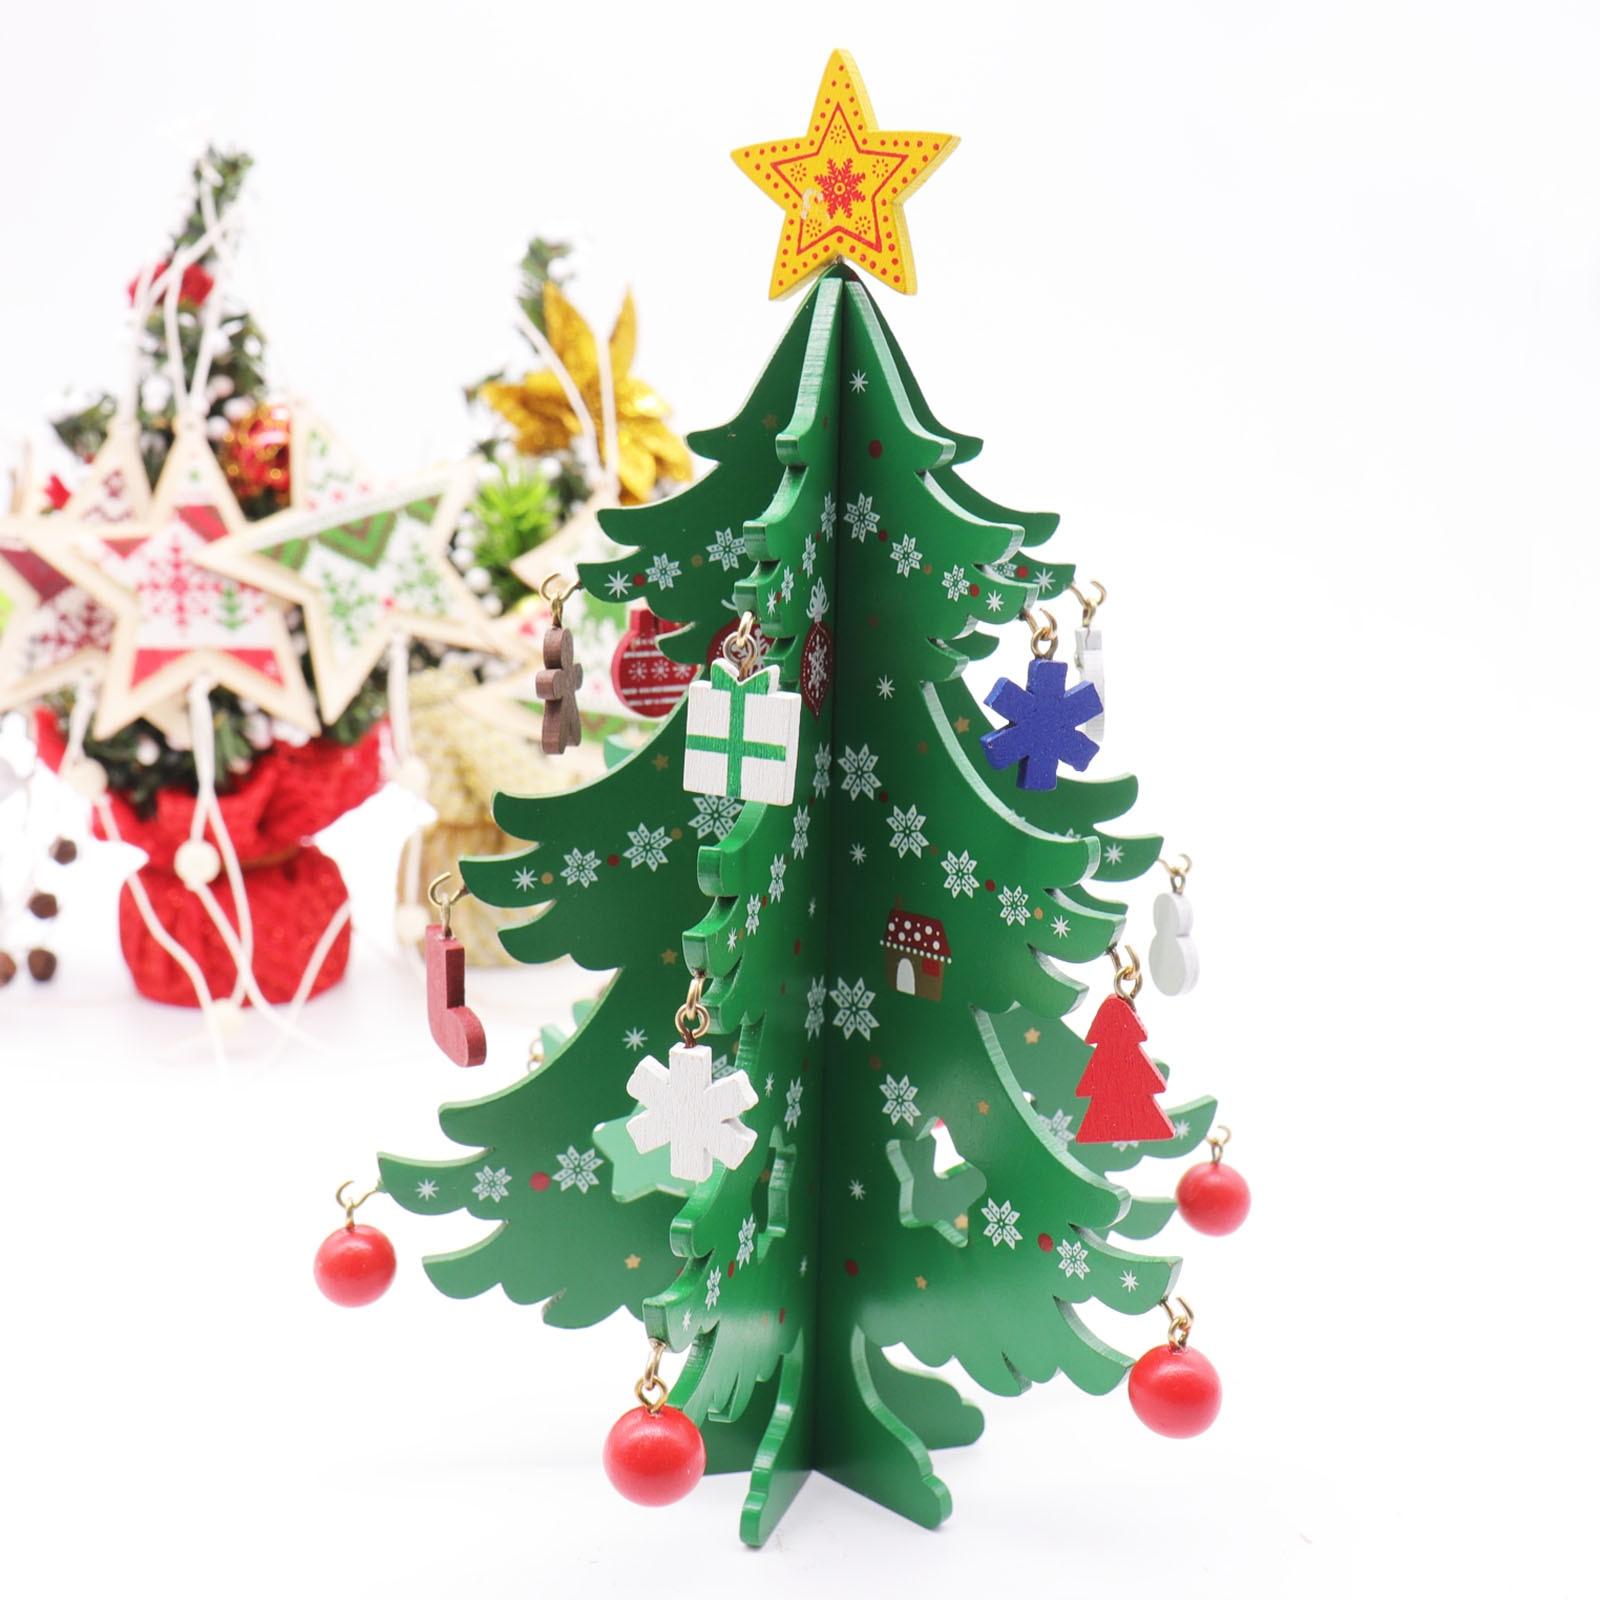 3D Innovative Christmas Tree Mini DIY Assemble Wooden Christmas